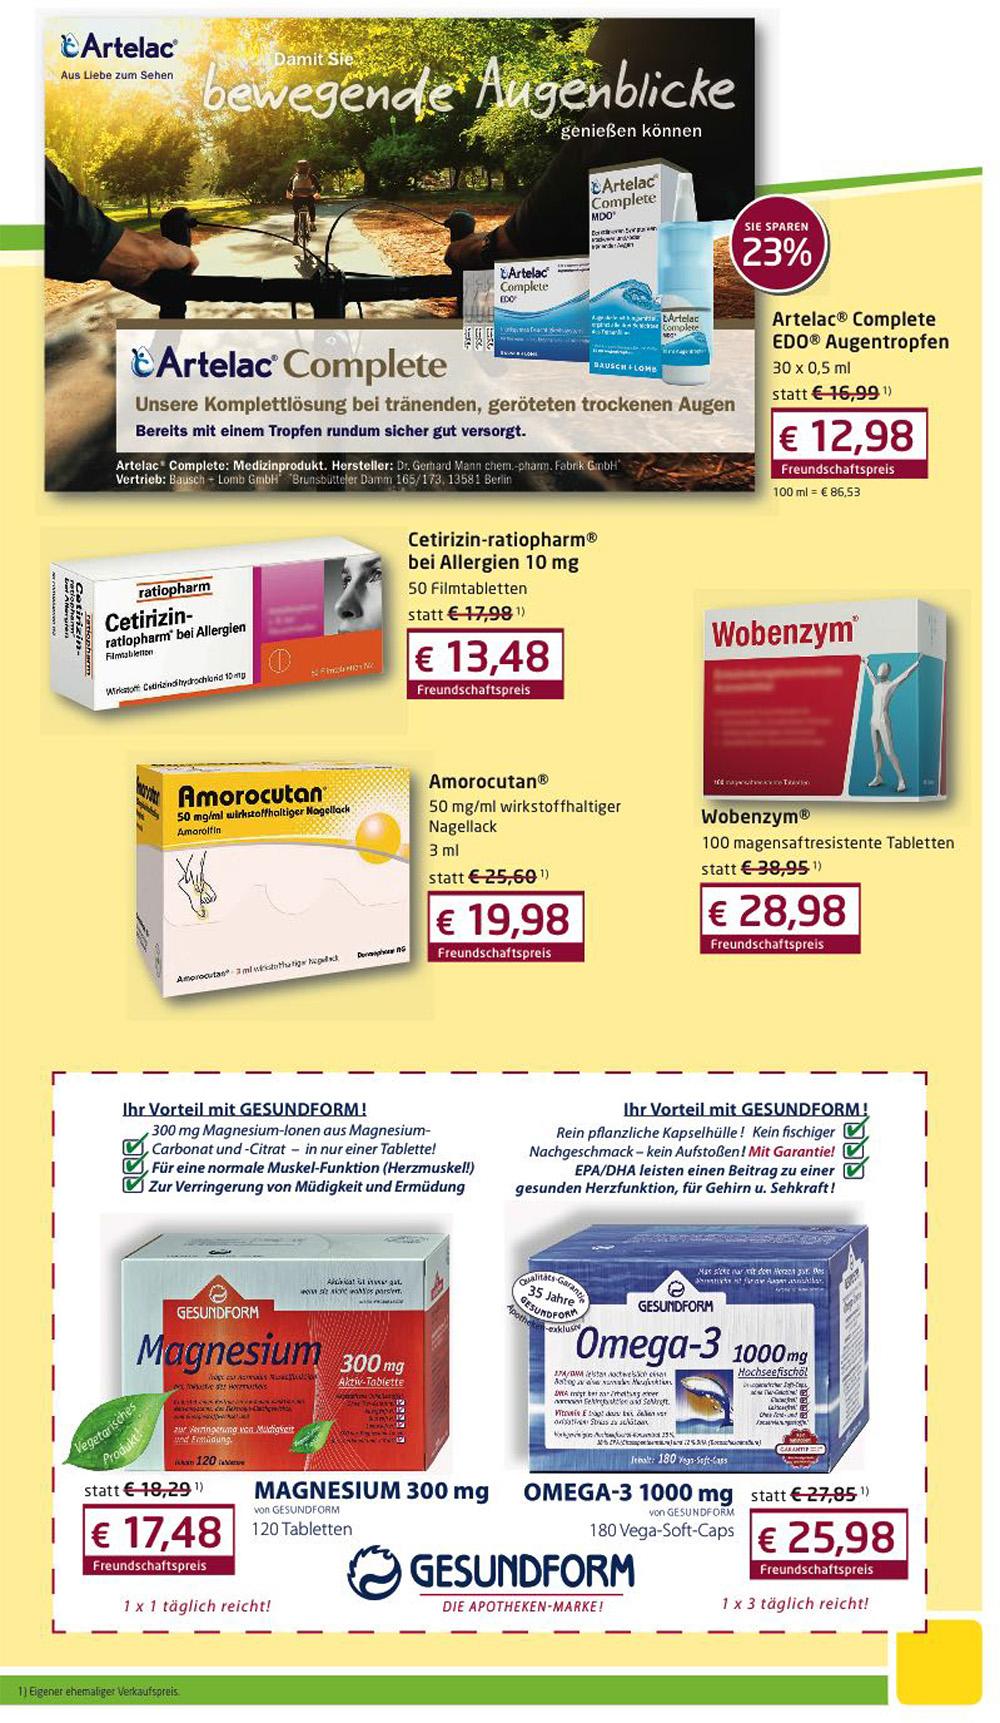 http://www.apotheken.de/fileadmin/clubarea/00000-Angebote/72488_Laizer_Angebote_5.jpg